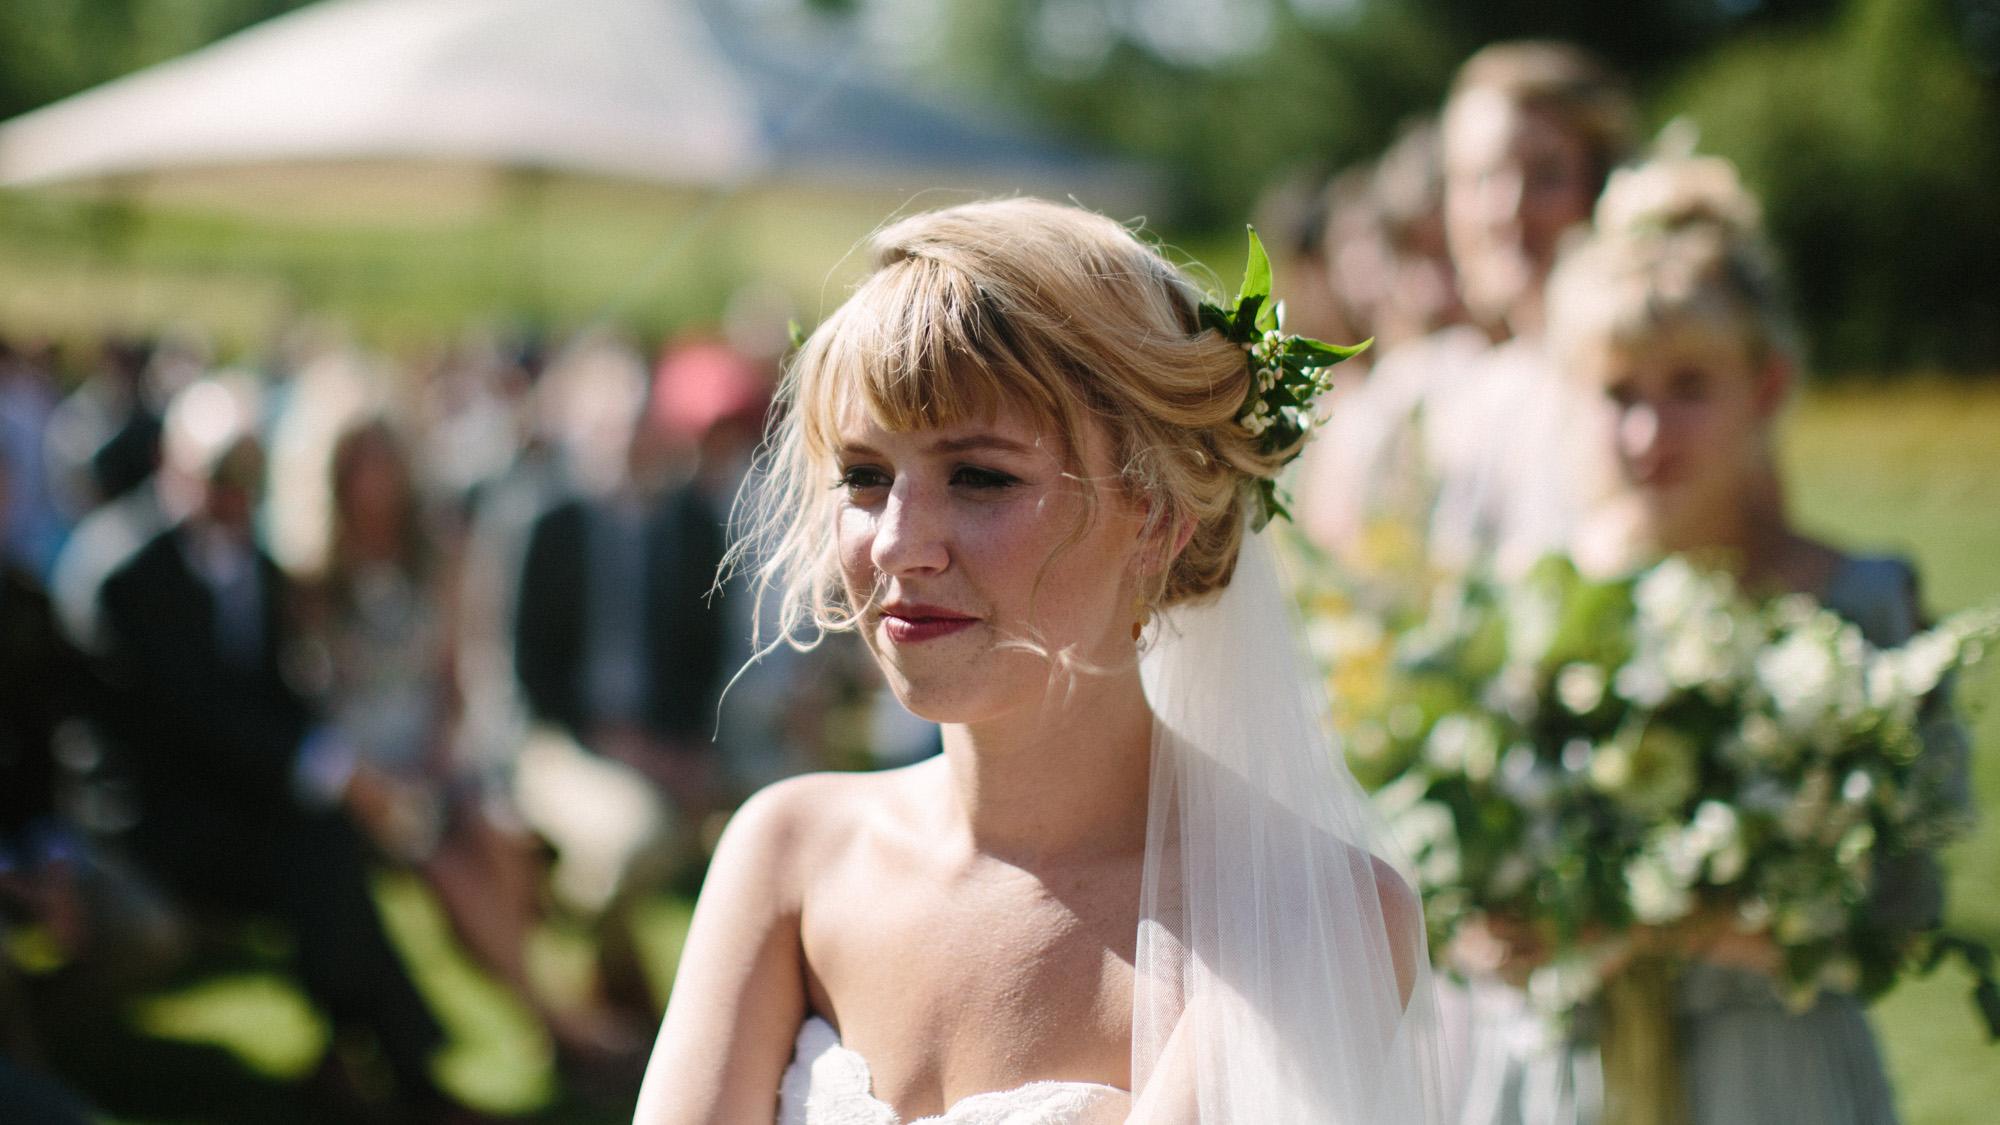 Montana_Wedding_Photos_alec_vanderboom-0095.jpg